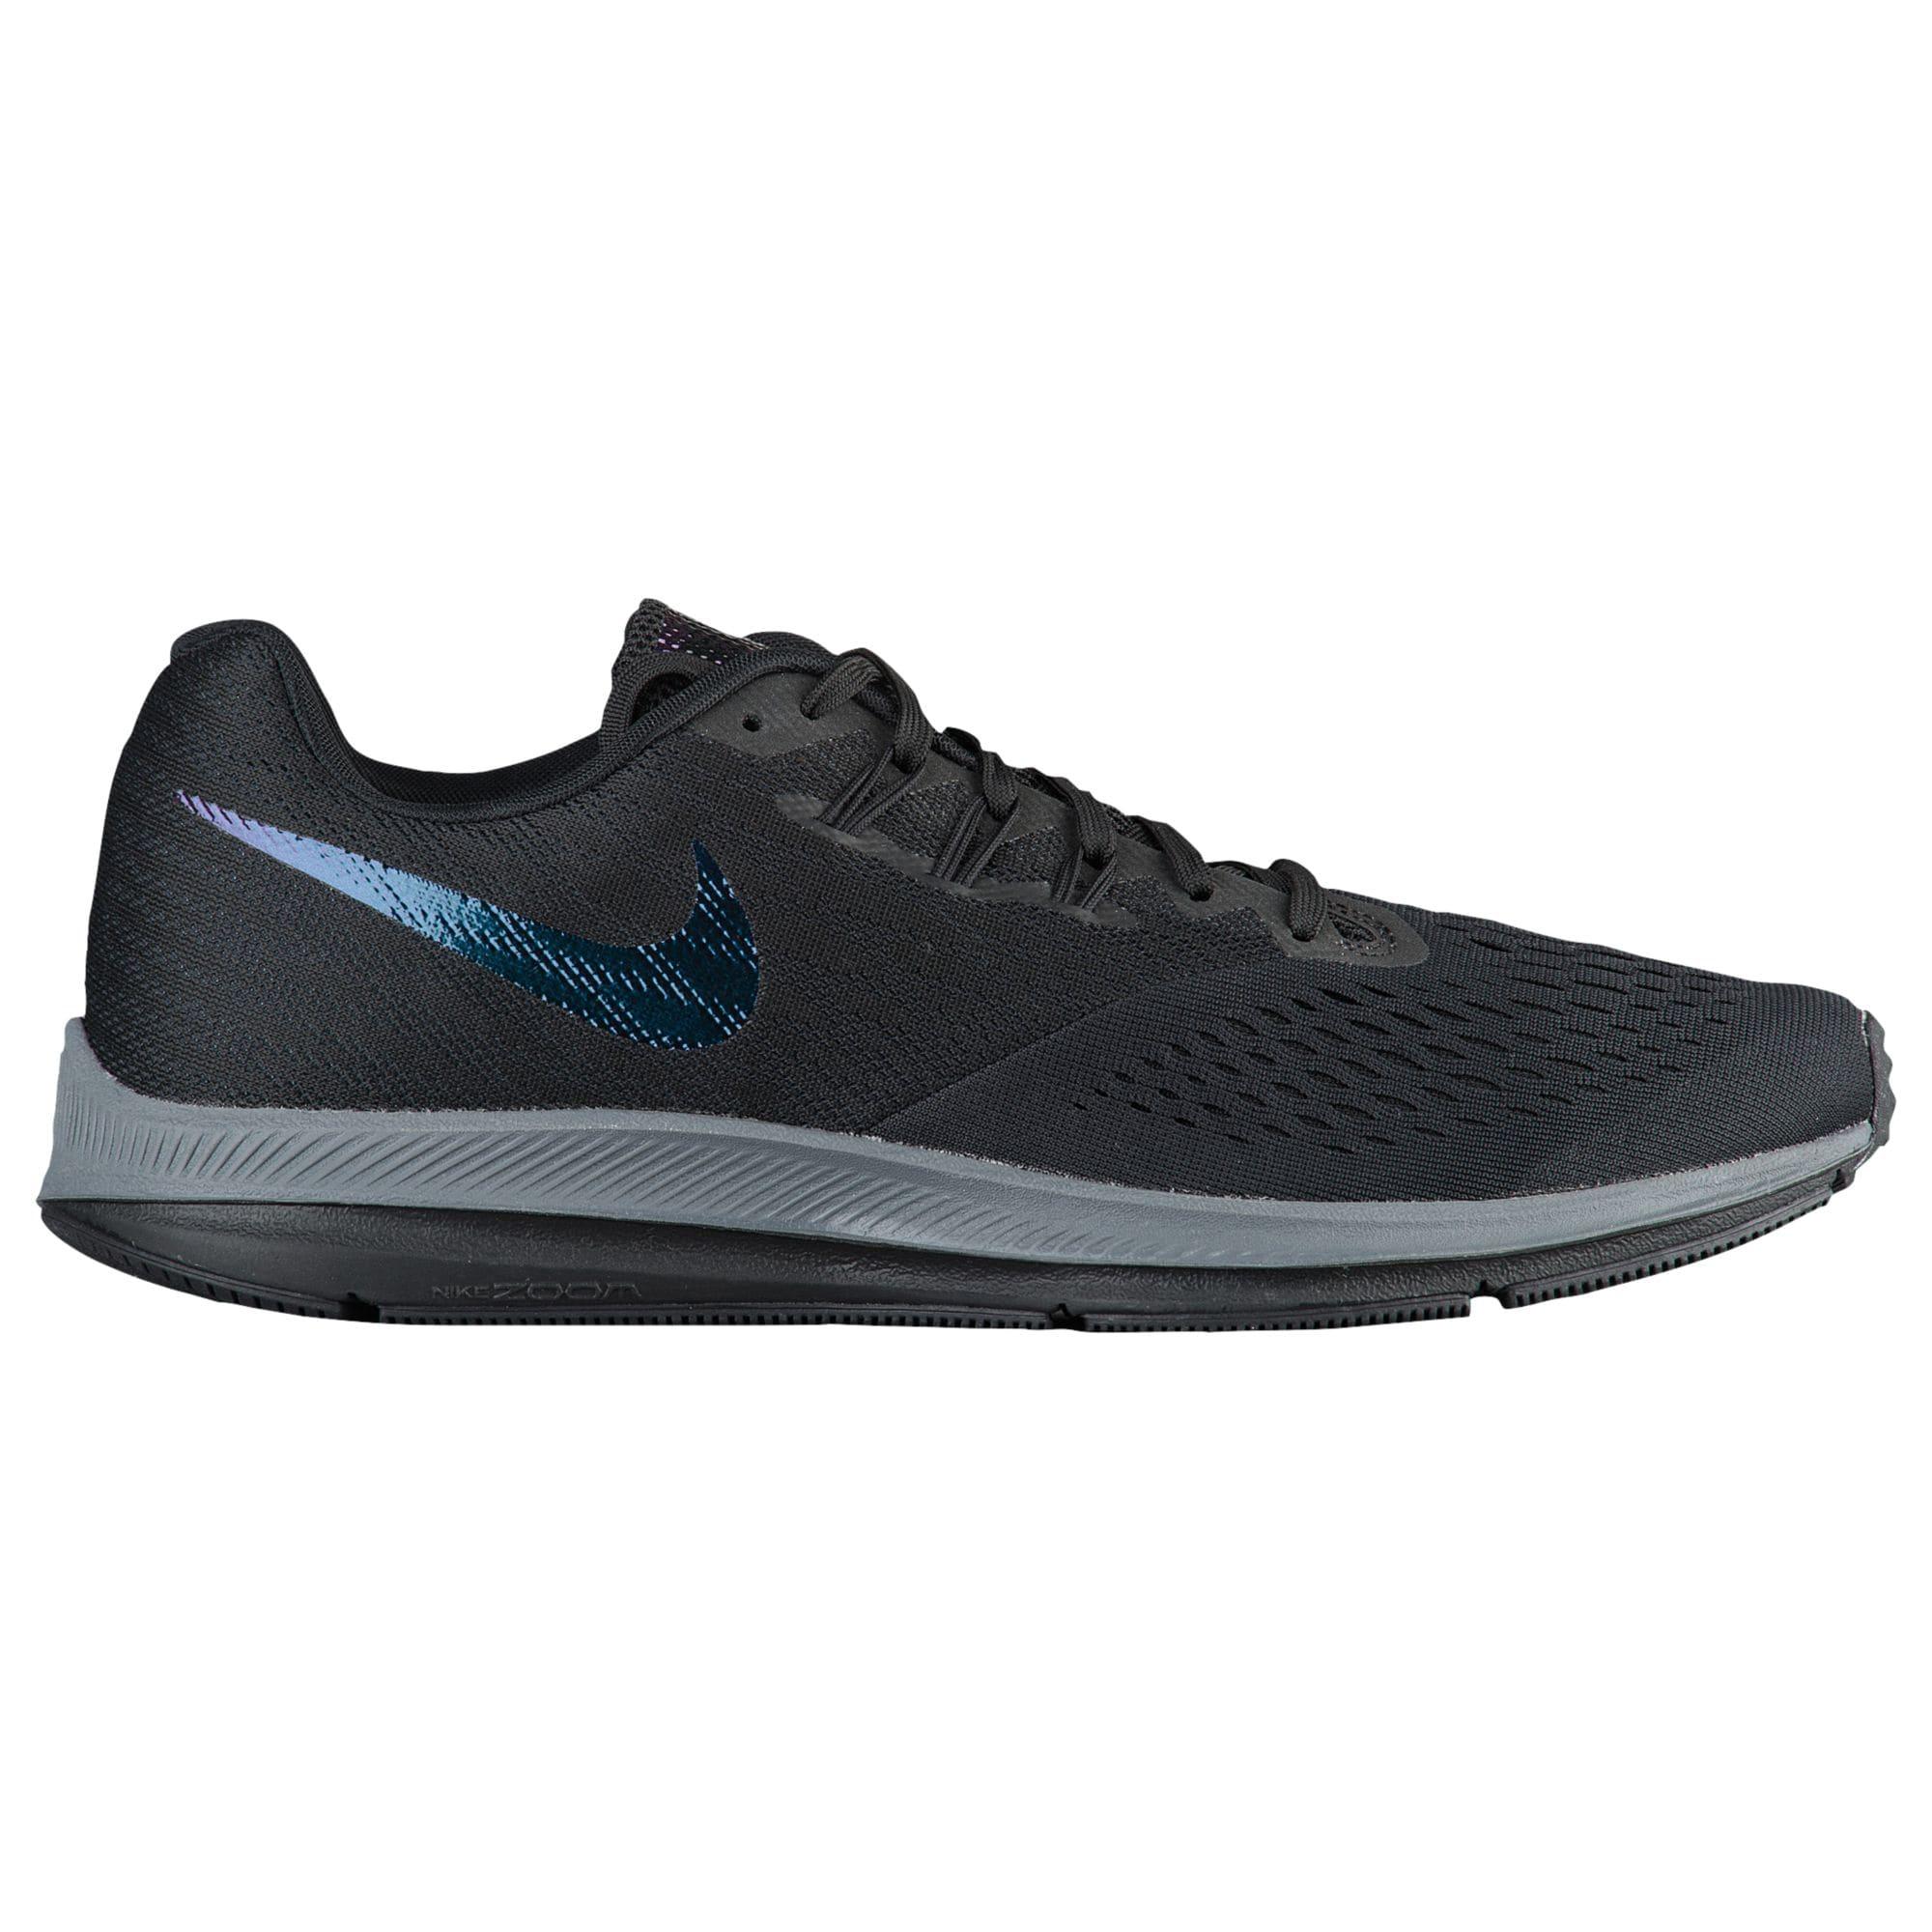 Nike Zoom Winflo 4 $46.99